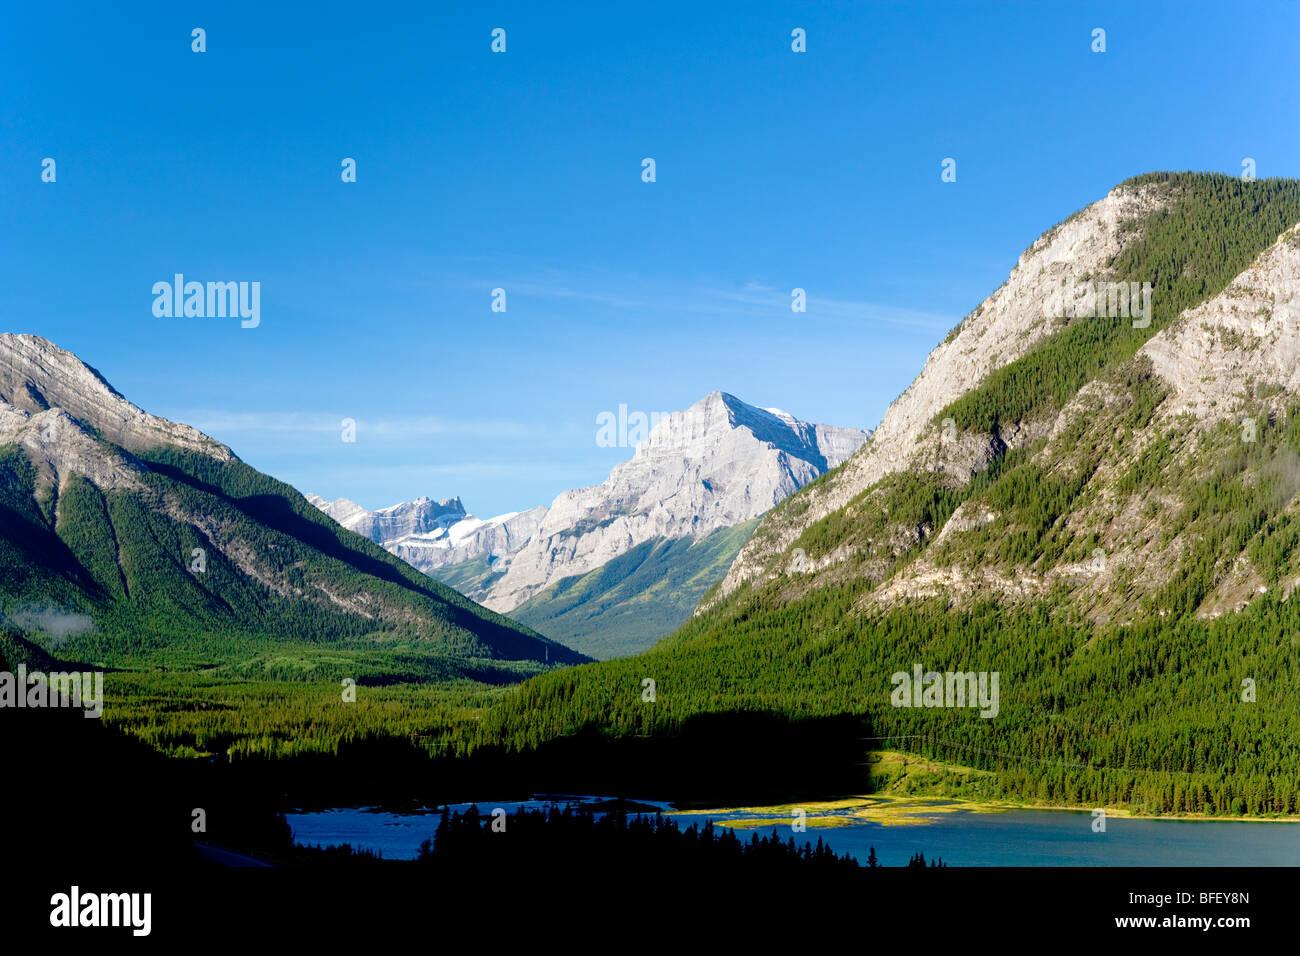 Barrier Lake, Kananaskis, Alberta, Canada, Lake, mountain, Rockies, Geological Formation, forest - Stock Image